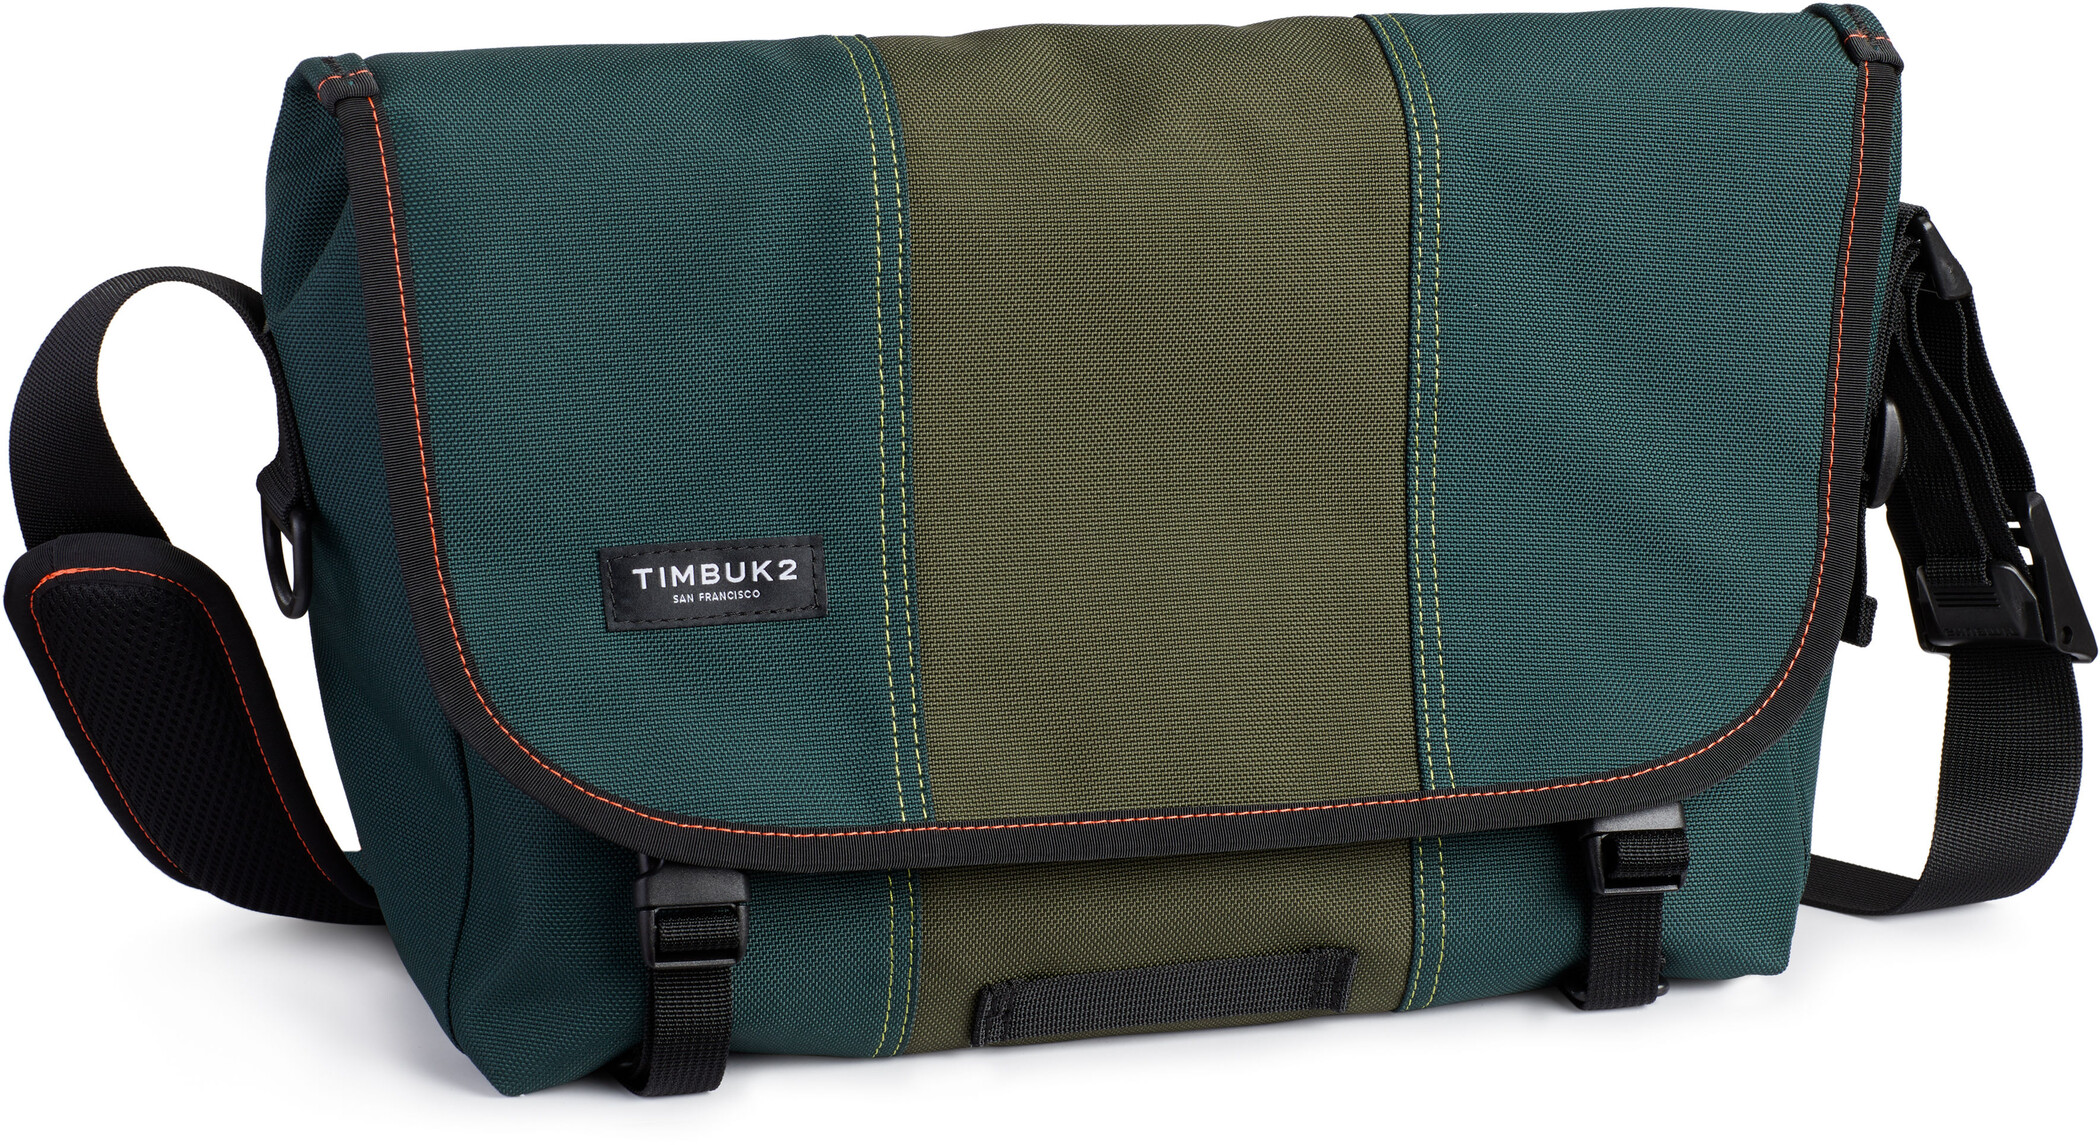 Timbuk2 Classic Taske S, toxic (2019) | Travel bags